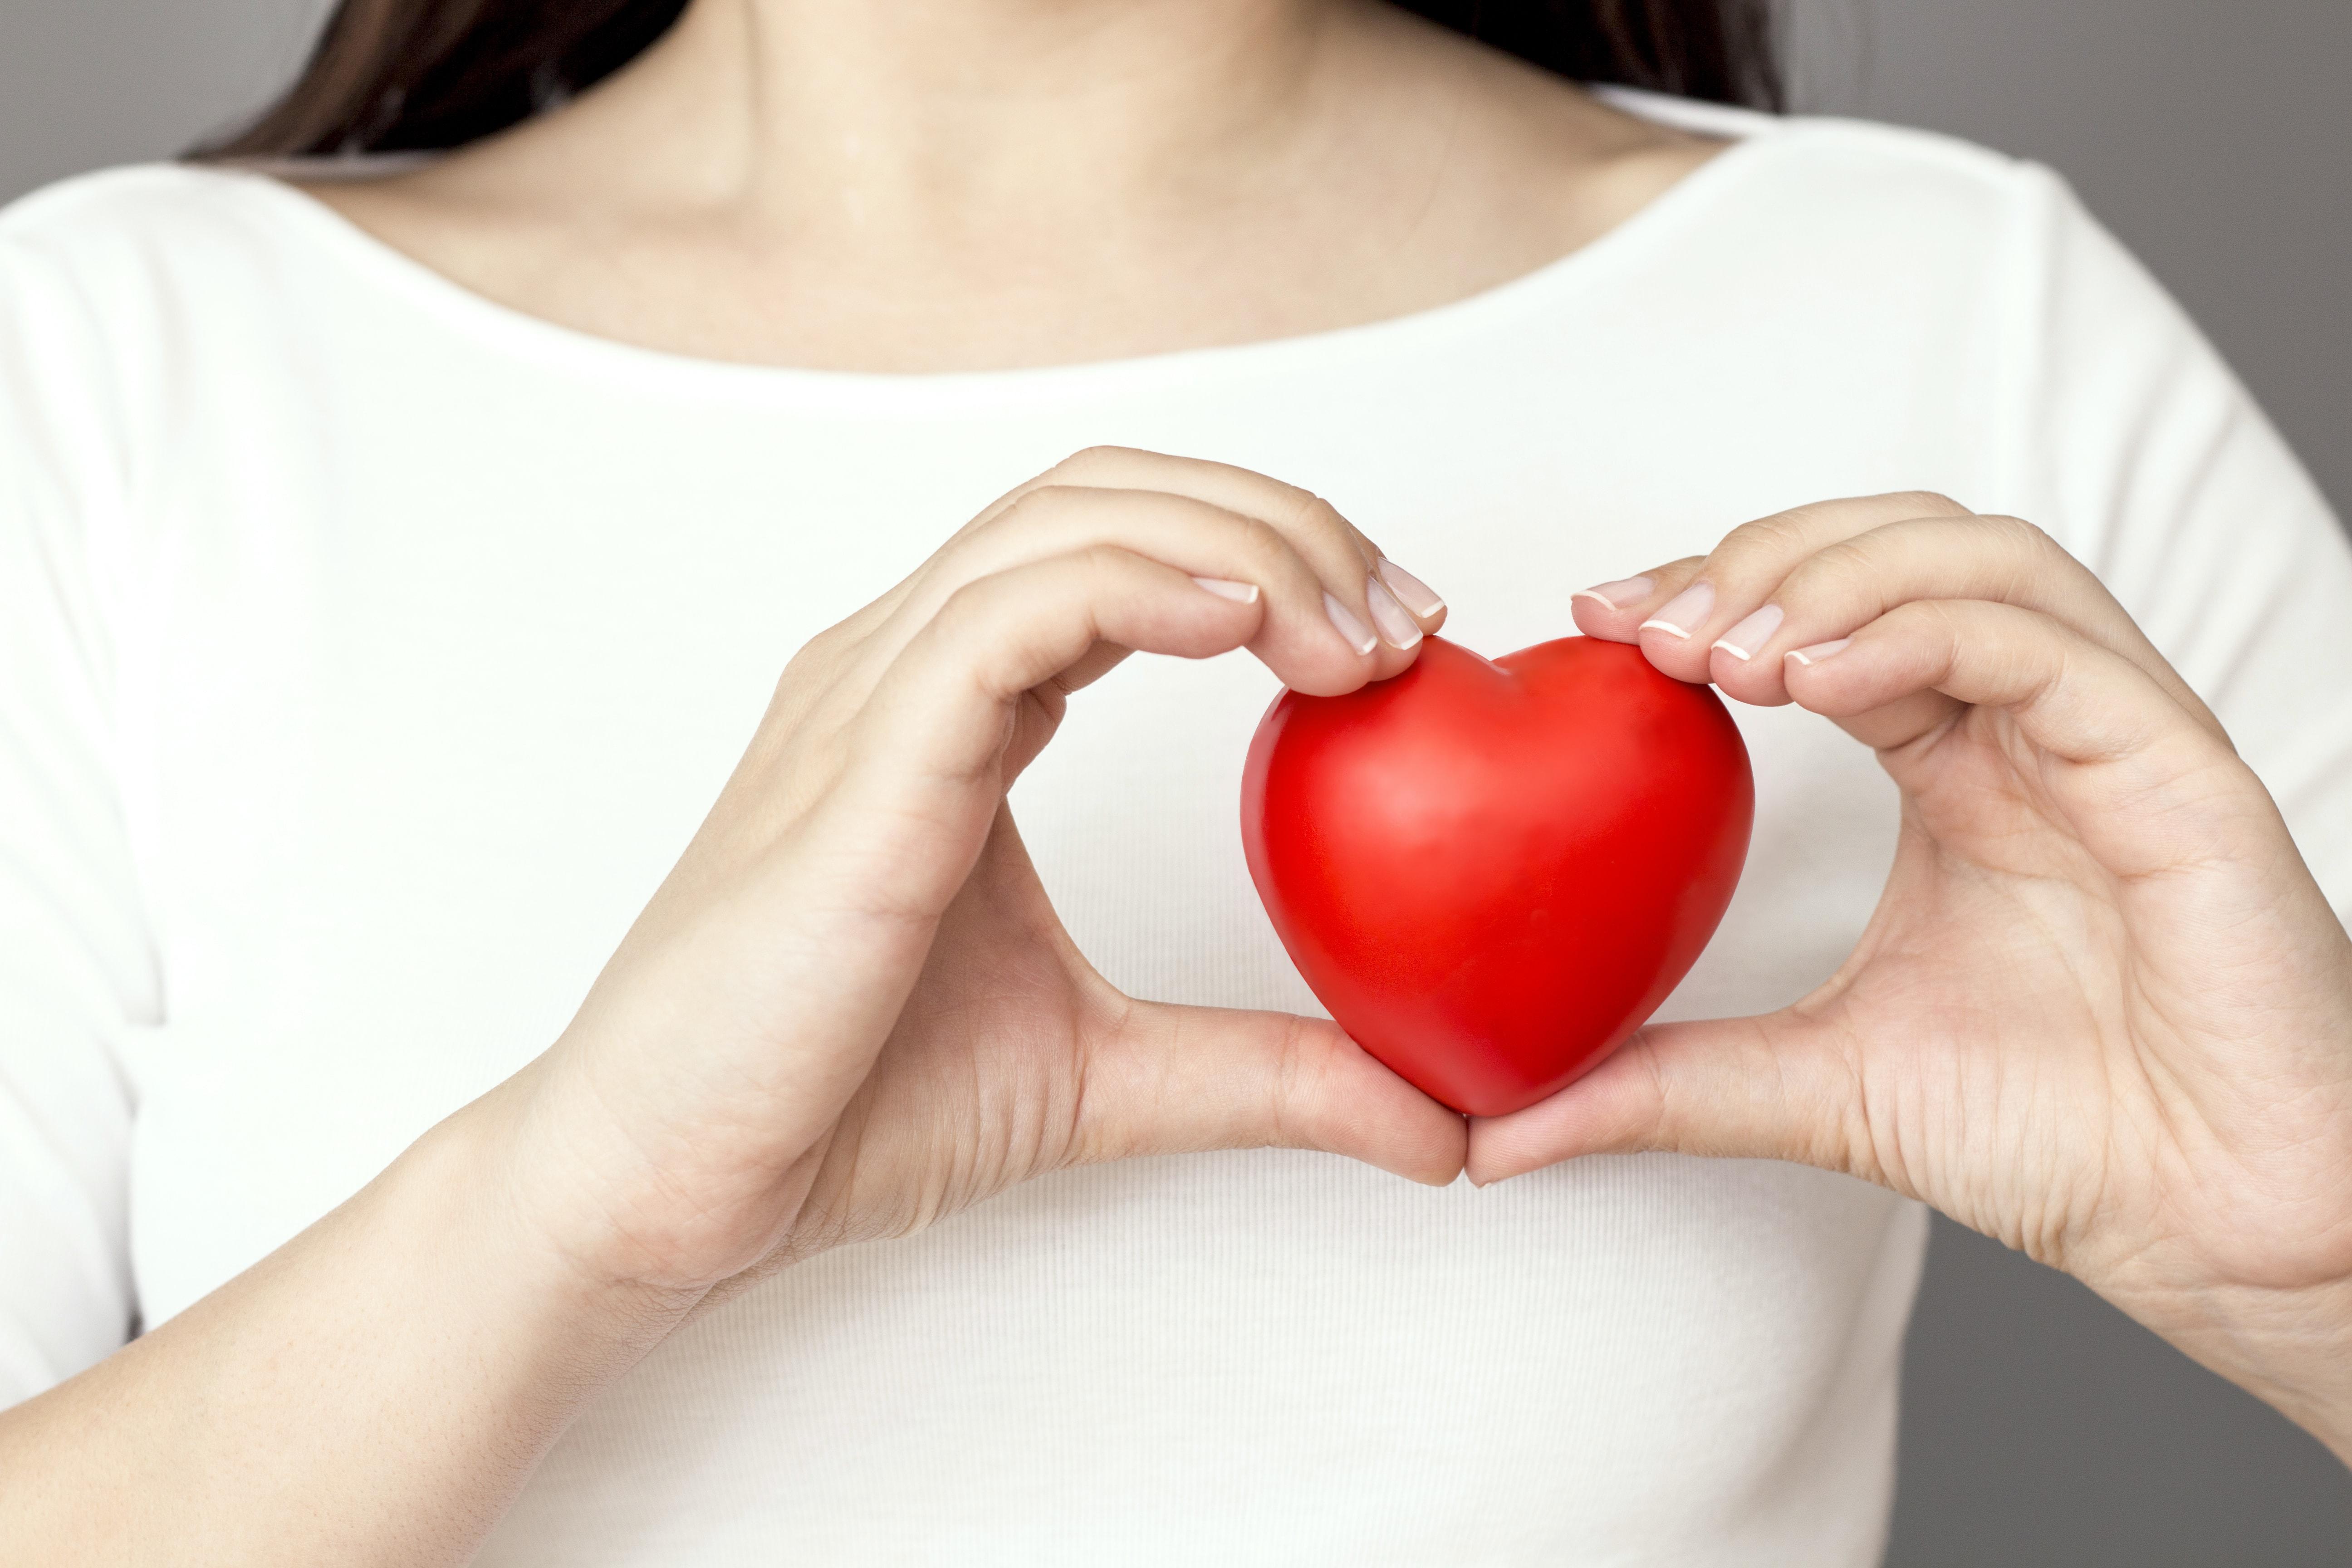 heart, heart month, heart disease, heart attack, stroke, arrhythmia, heart valve problems, cardiovascular disease